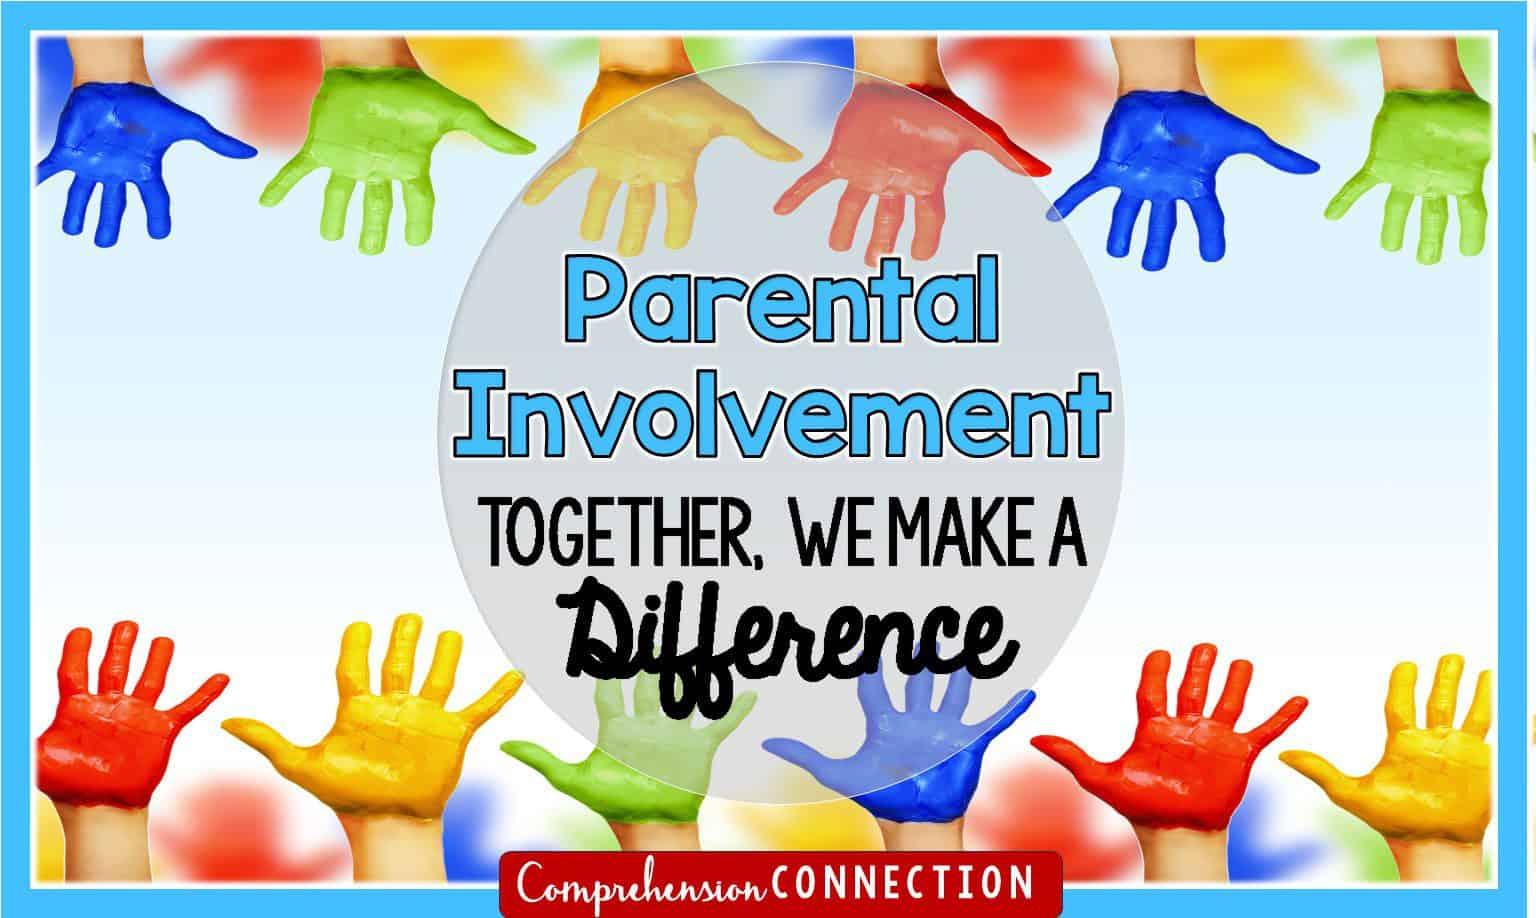 parent2binvolvement-4849556